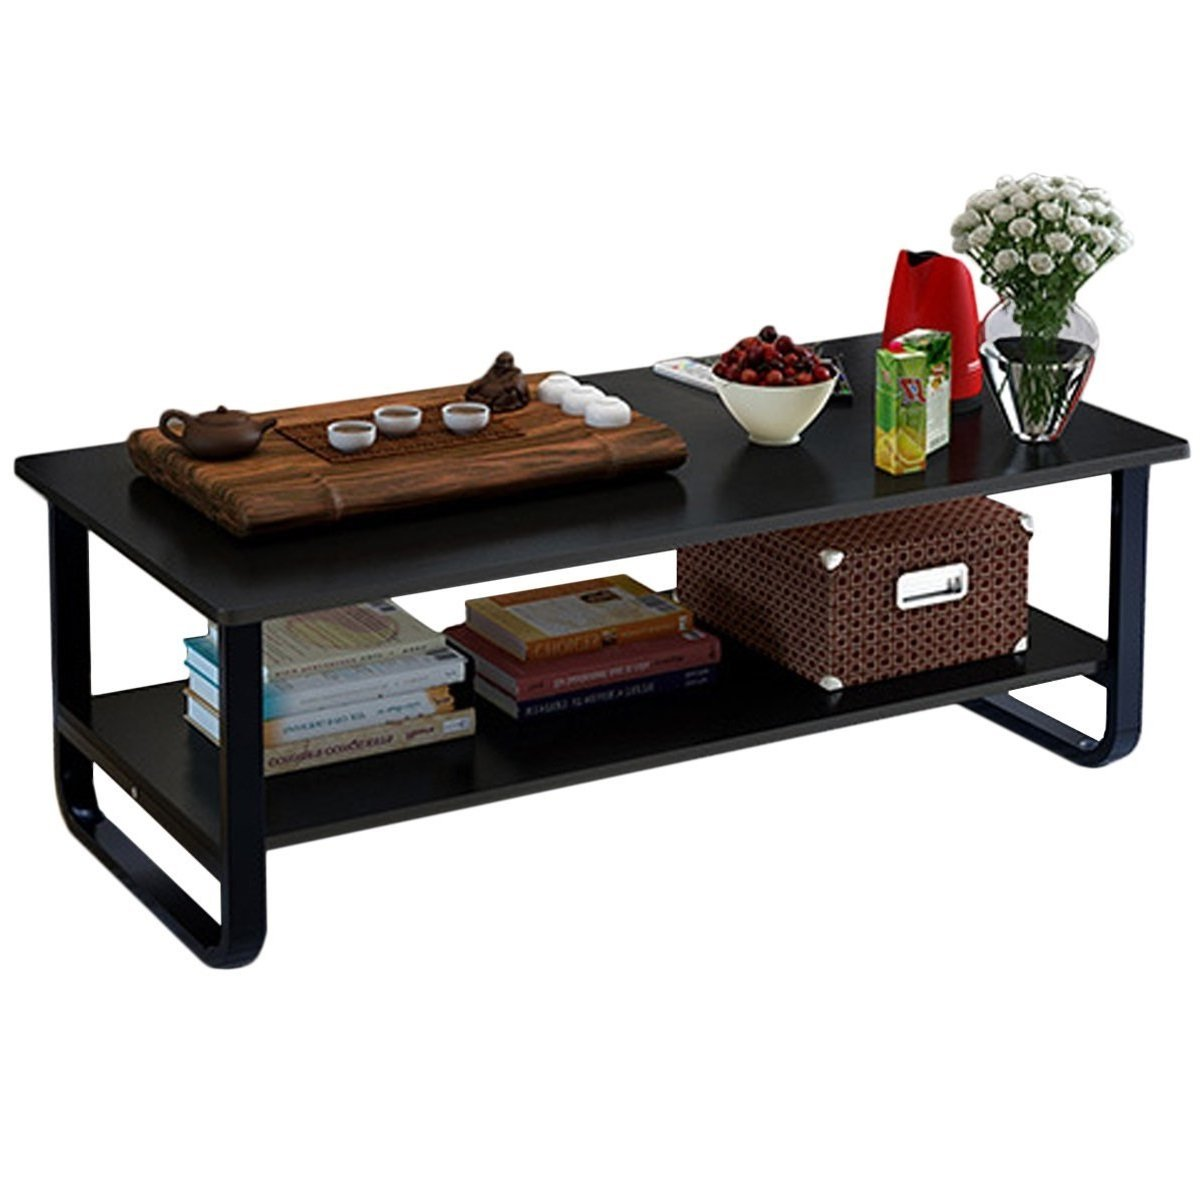 rectangular coffee tea table with storage shelf black 606157362772 ebay. Black Bedroom Furniture Sets. Home Design Ideas